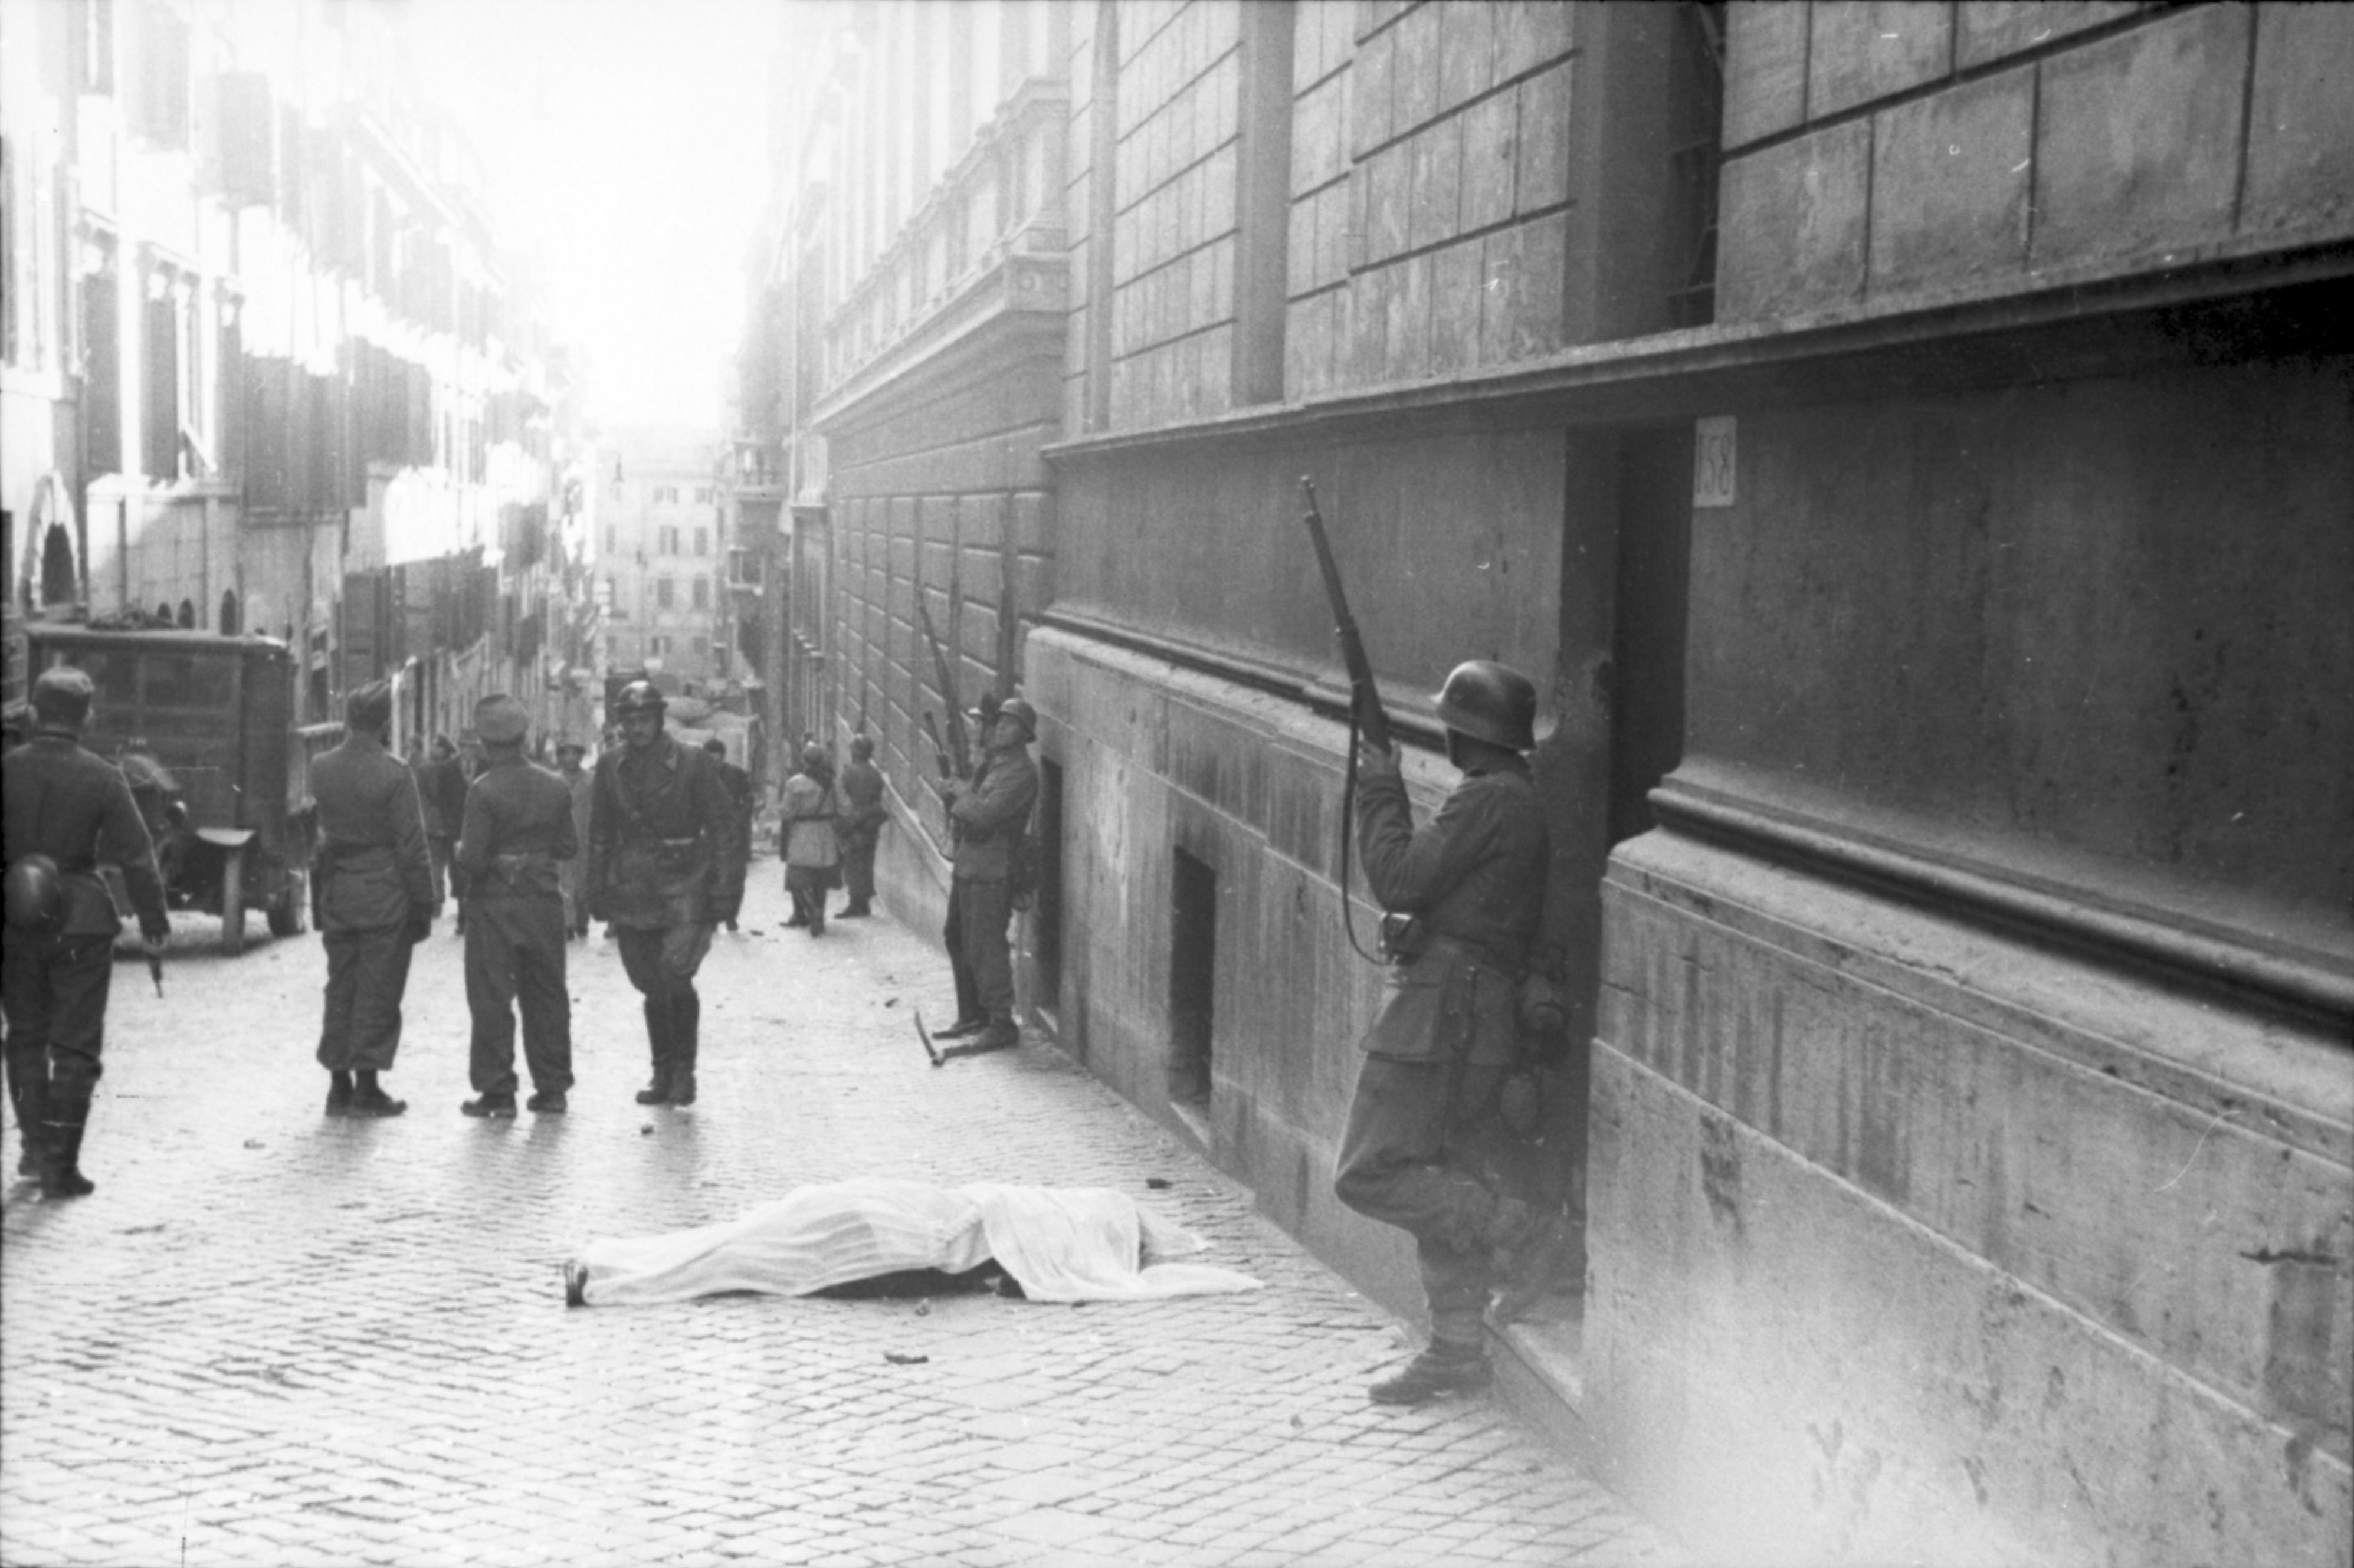 Bundesarchiv Bild 101I-312-0983-10, Rom, Soldaten vor Gebäude.jpg